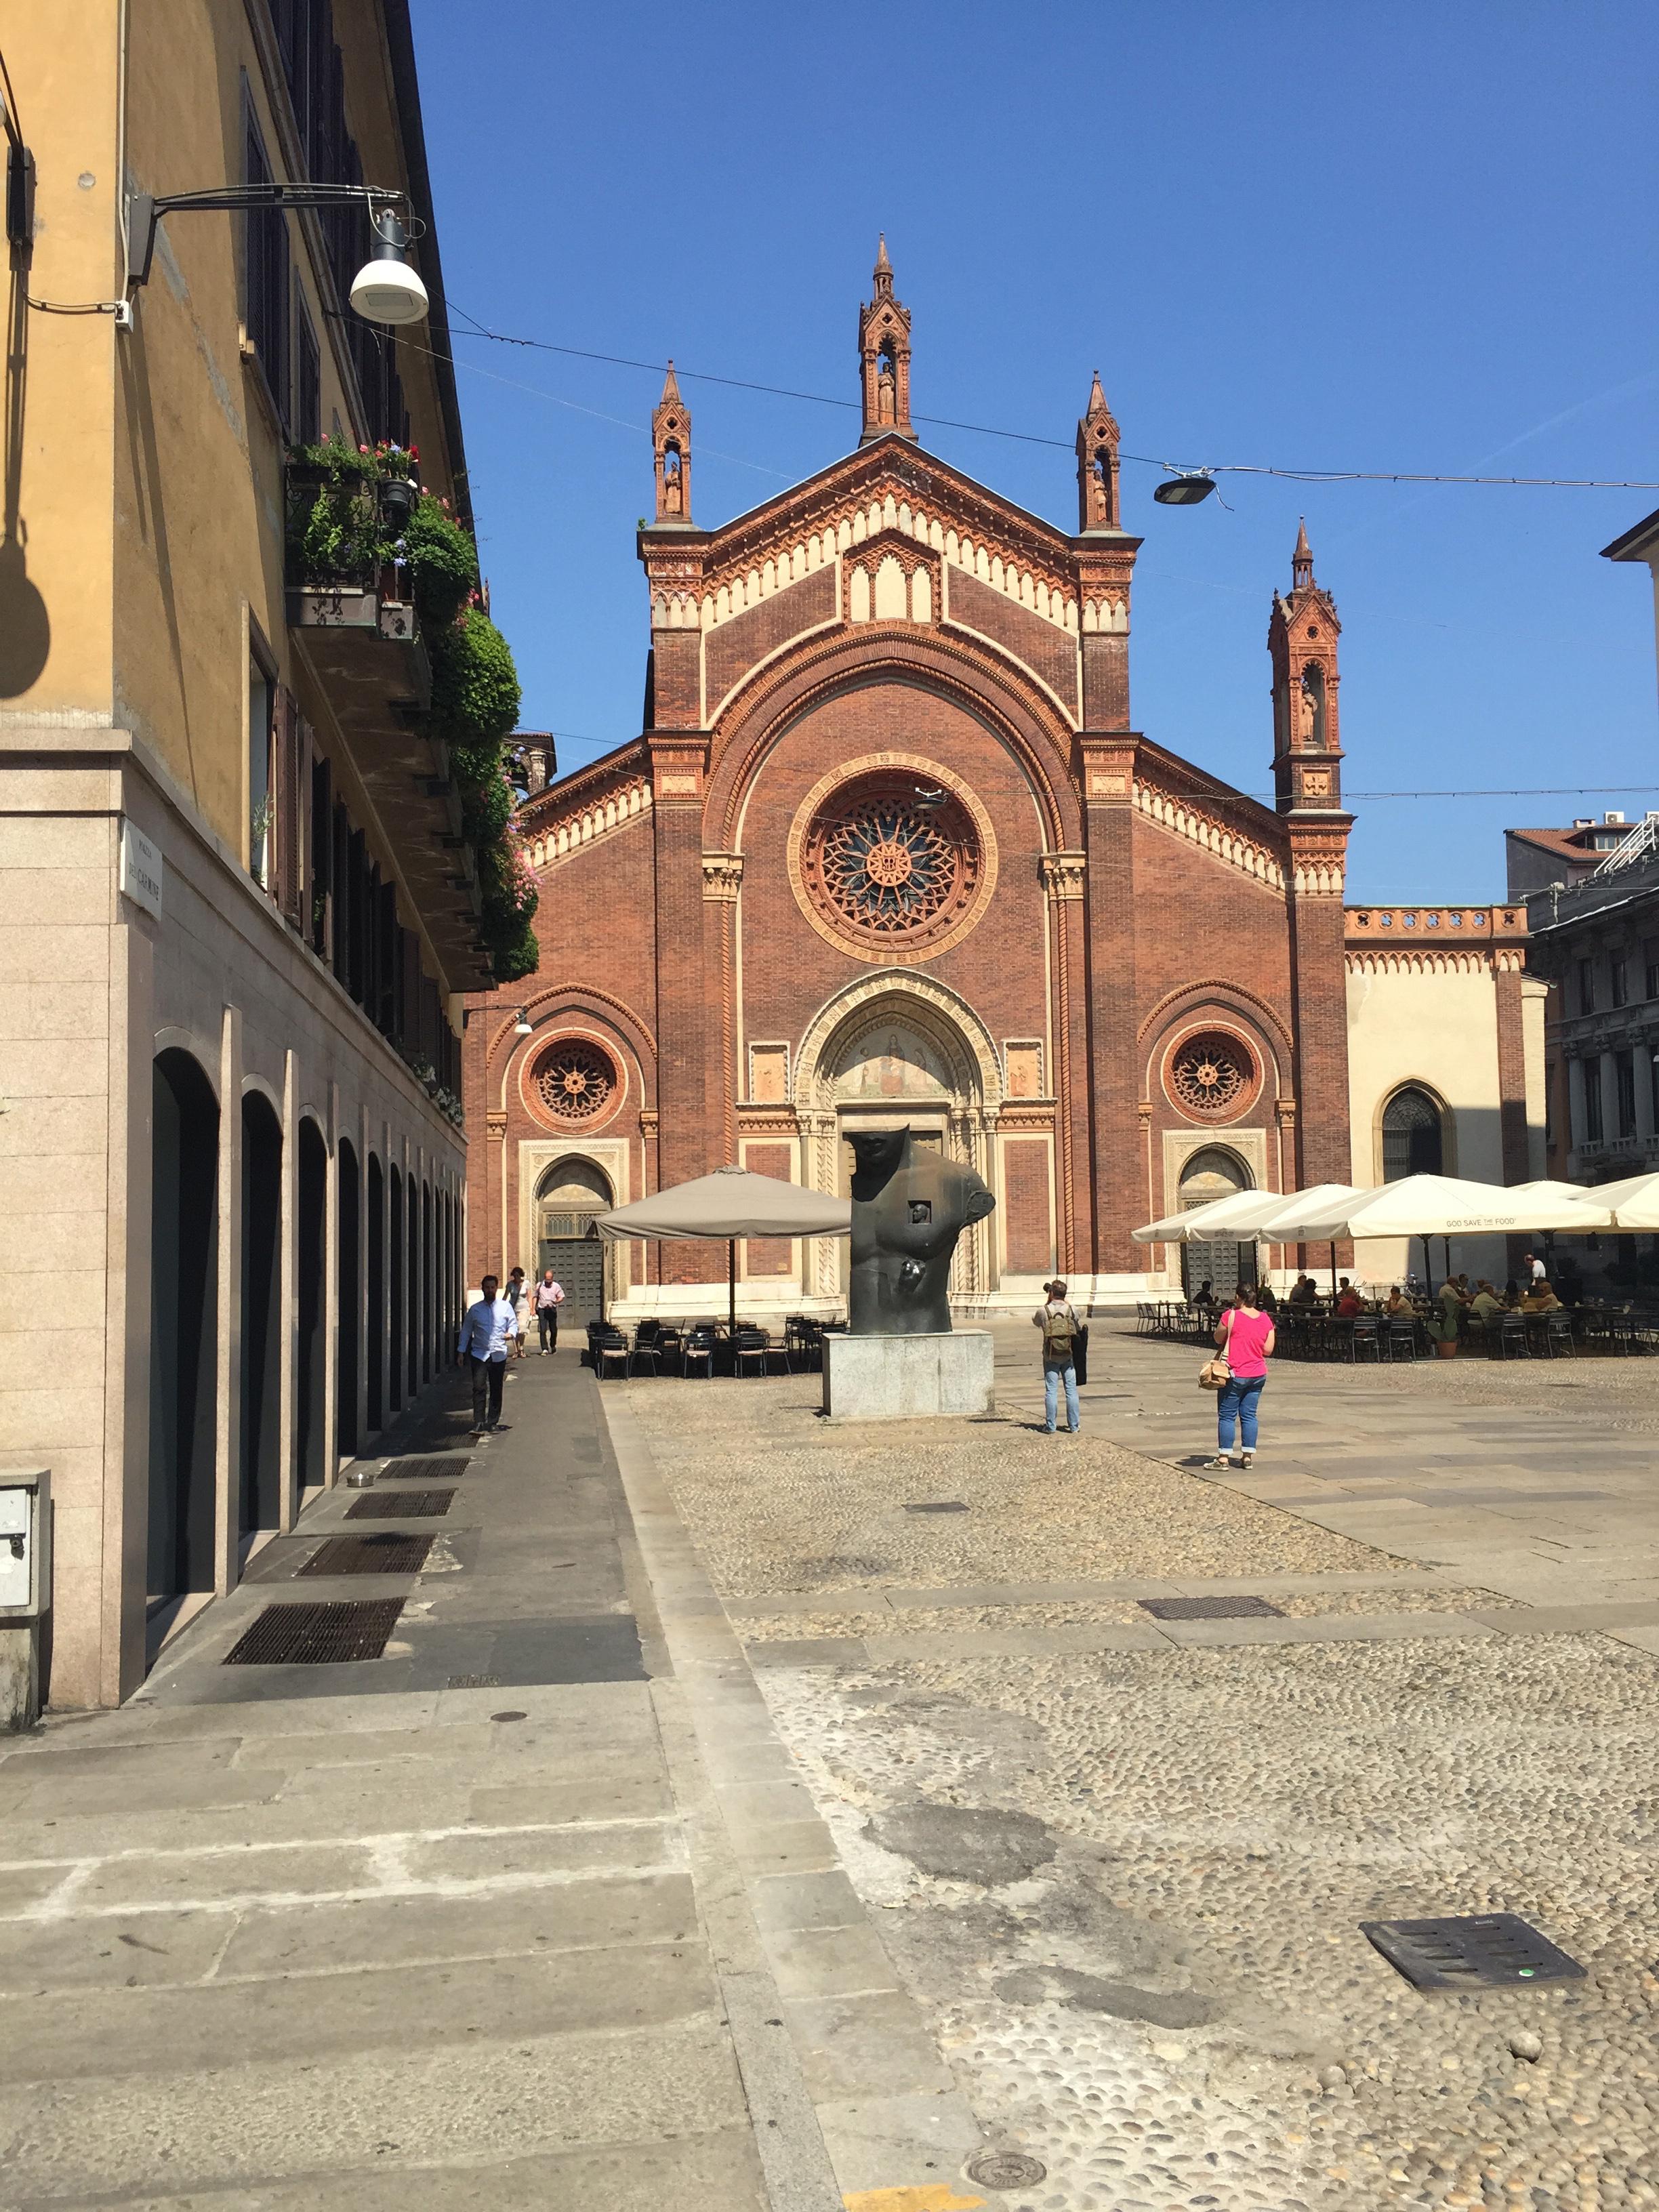 Another church off Garibaldi Brera